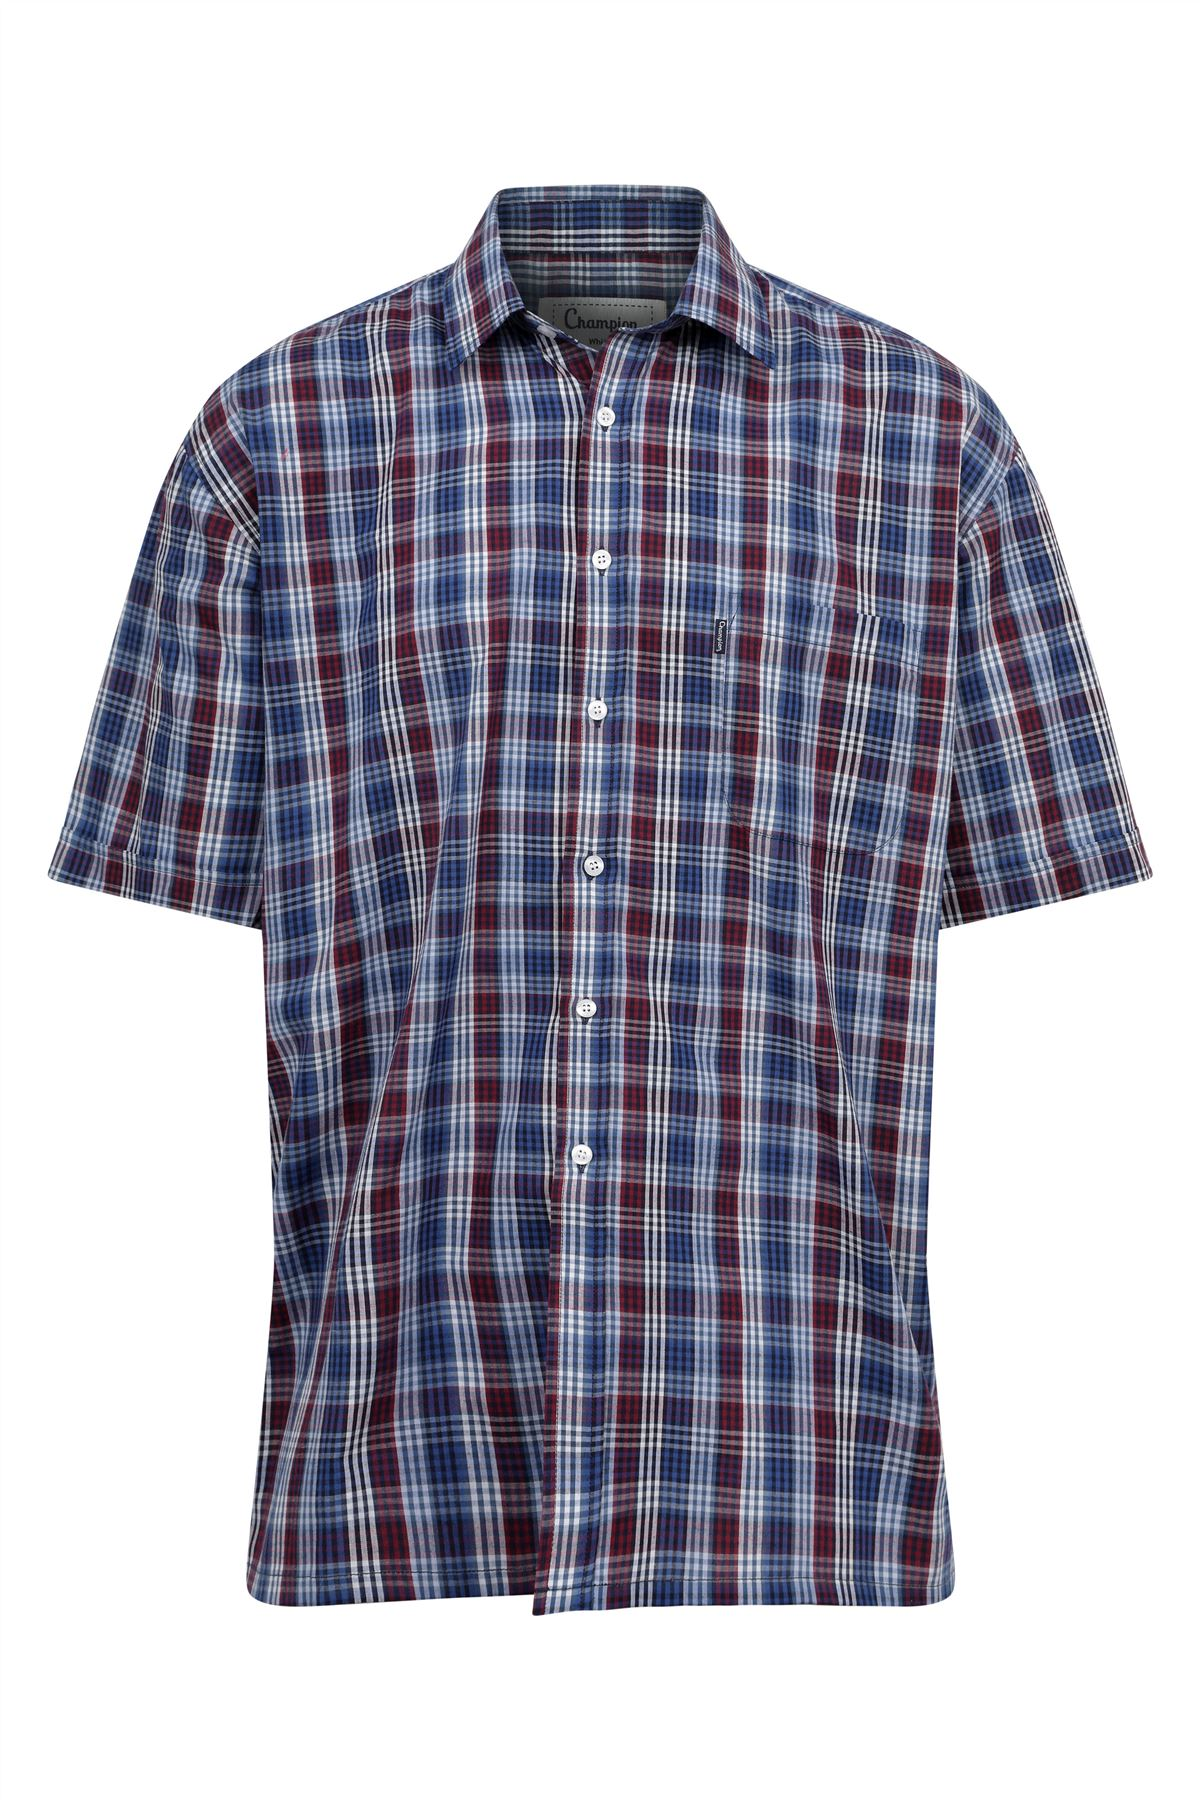 Champion-Mens-Shirt-Check-Short-Sleeve-Polycotton-Country-Casual thumbnail 9